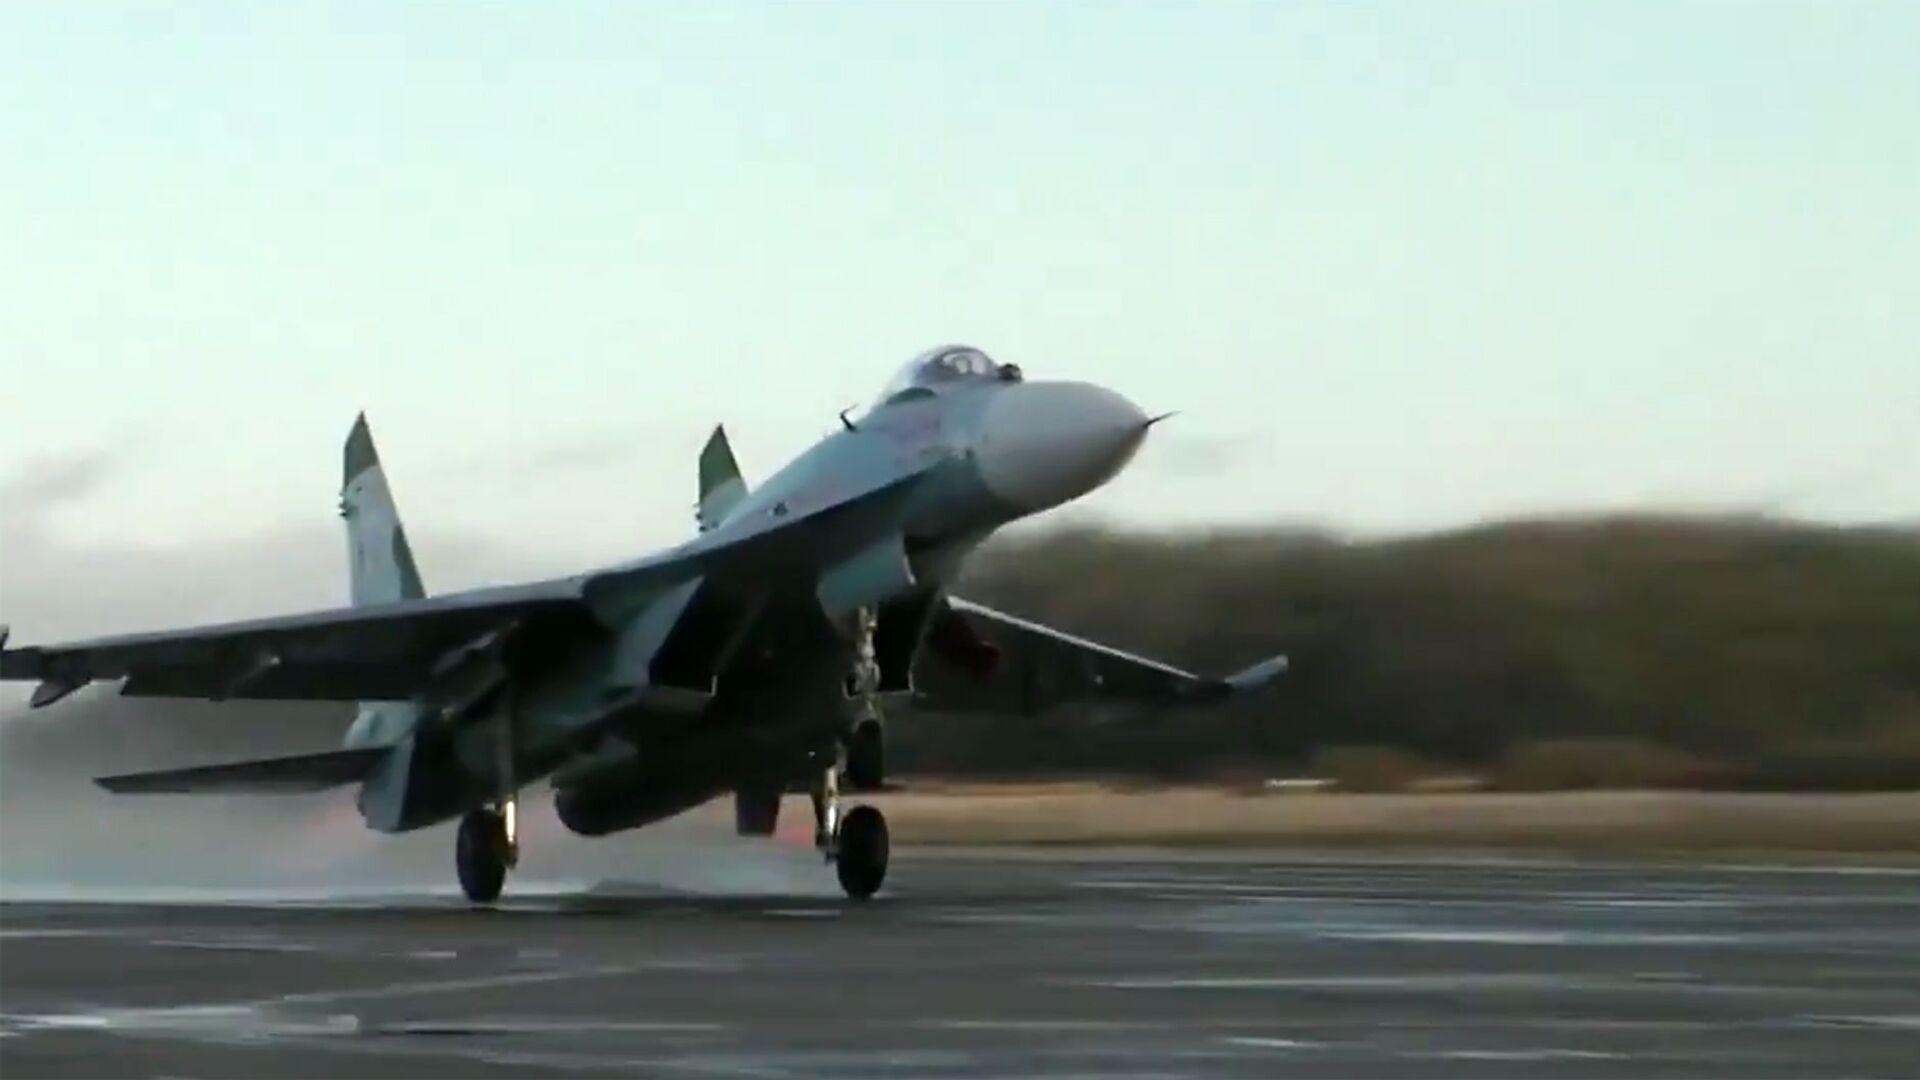 Скриншот видео перехвата истребителем Су-27 самолета-разведчика Гольфстрим ВВС Швеции  - РИА Новости, 1920, 17.09.2020